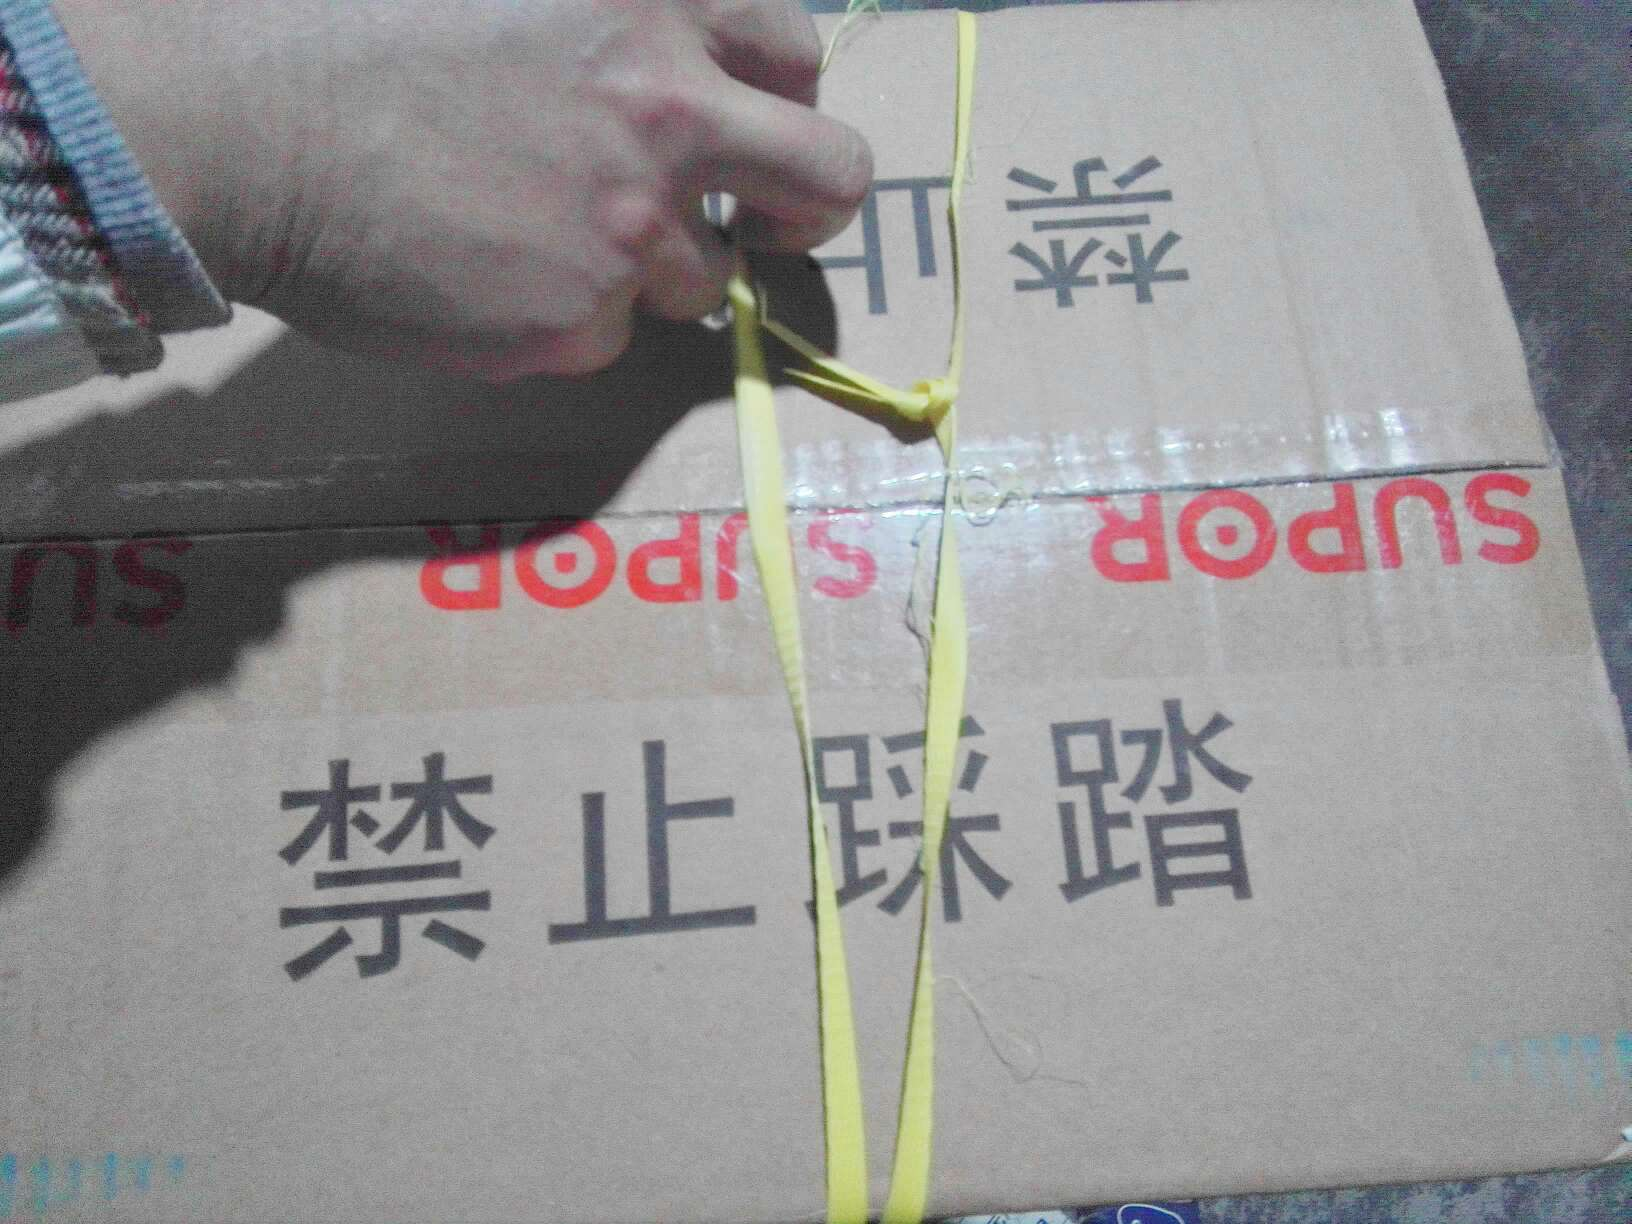 shox r4 womens 00236132 wholesale